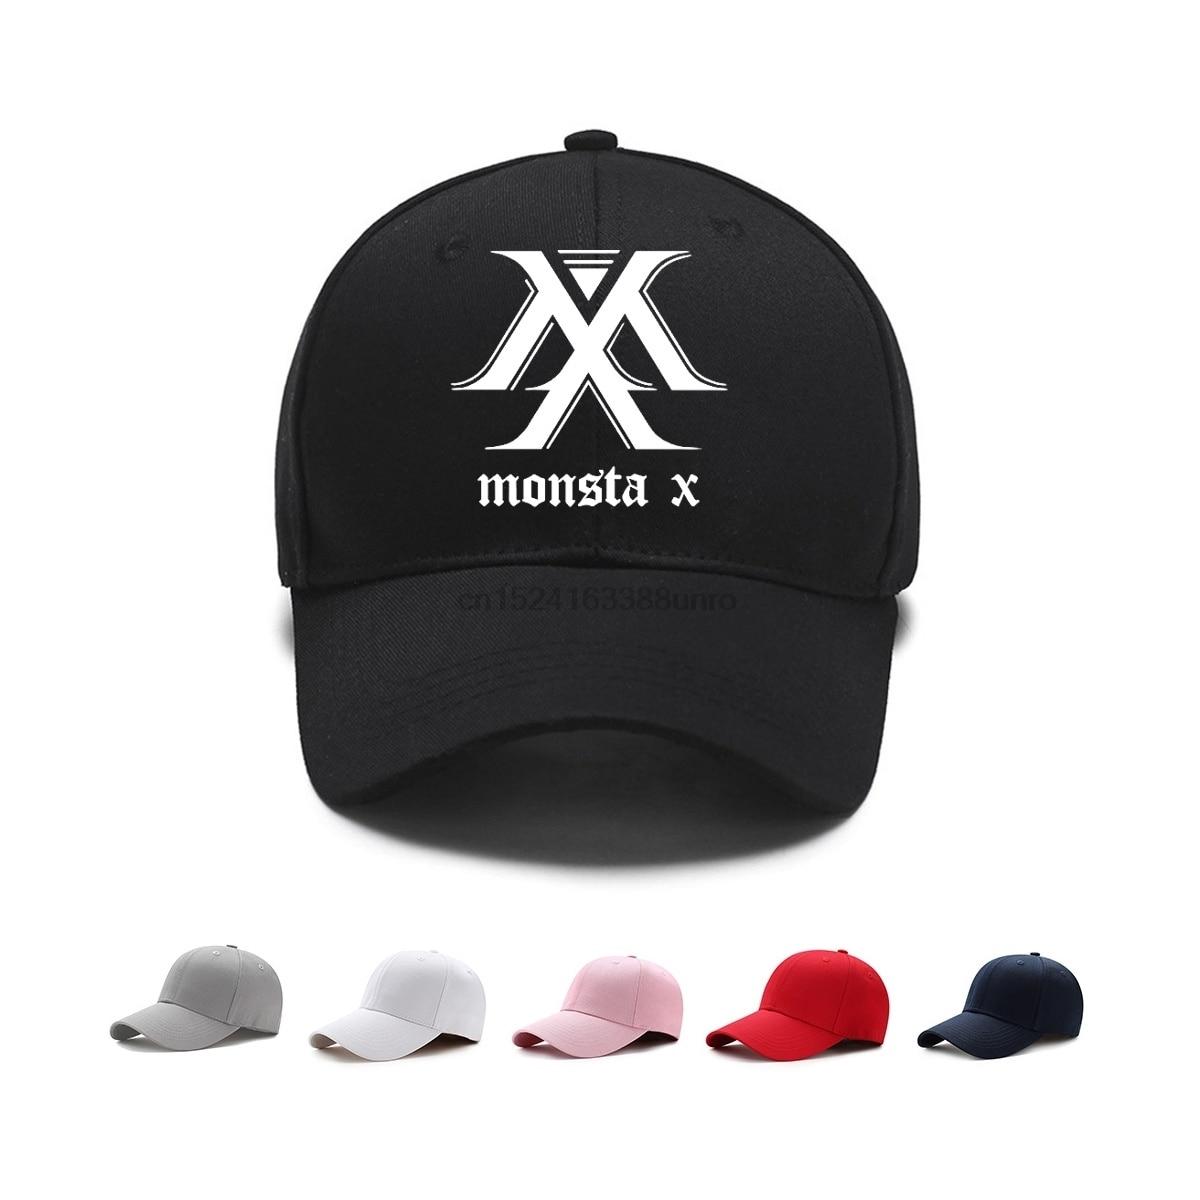 Independent Kpop Stars Bts Exo Got7 Baseball Cap Monsta X Seventeen Fashion Adjustable Snapback Hats Hiphop Apparel Accessories Men's Hats